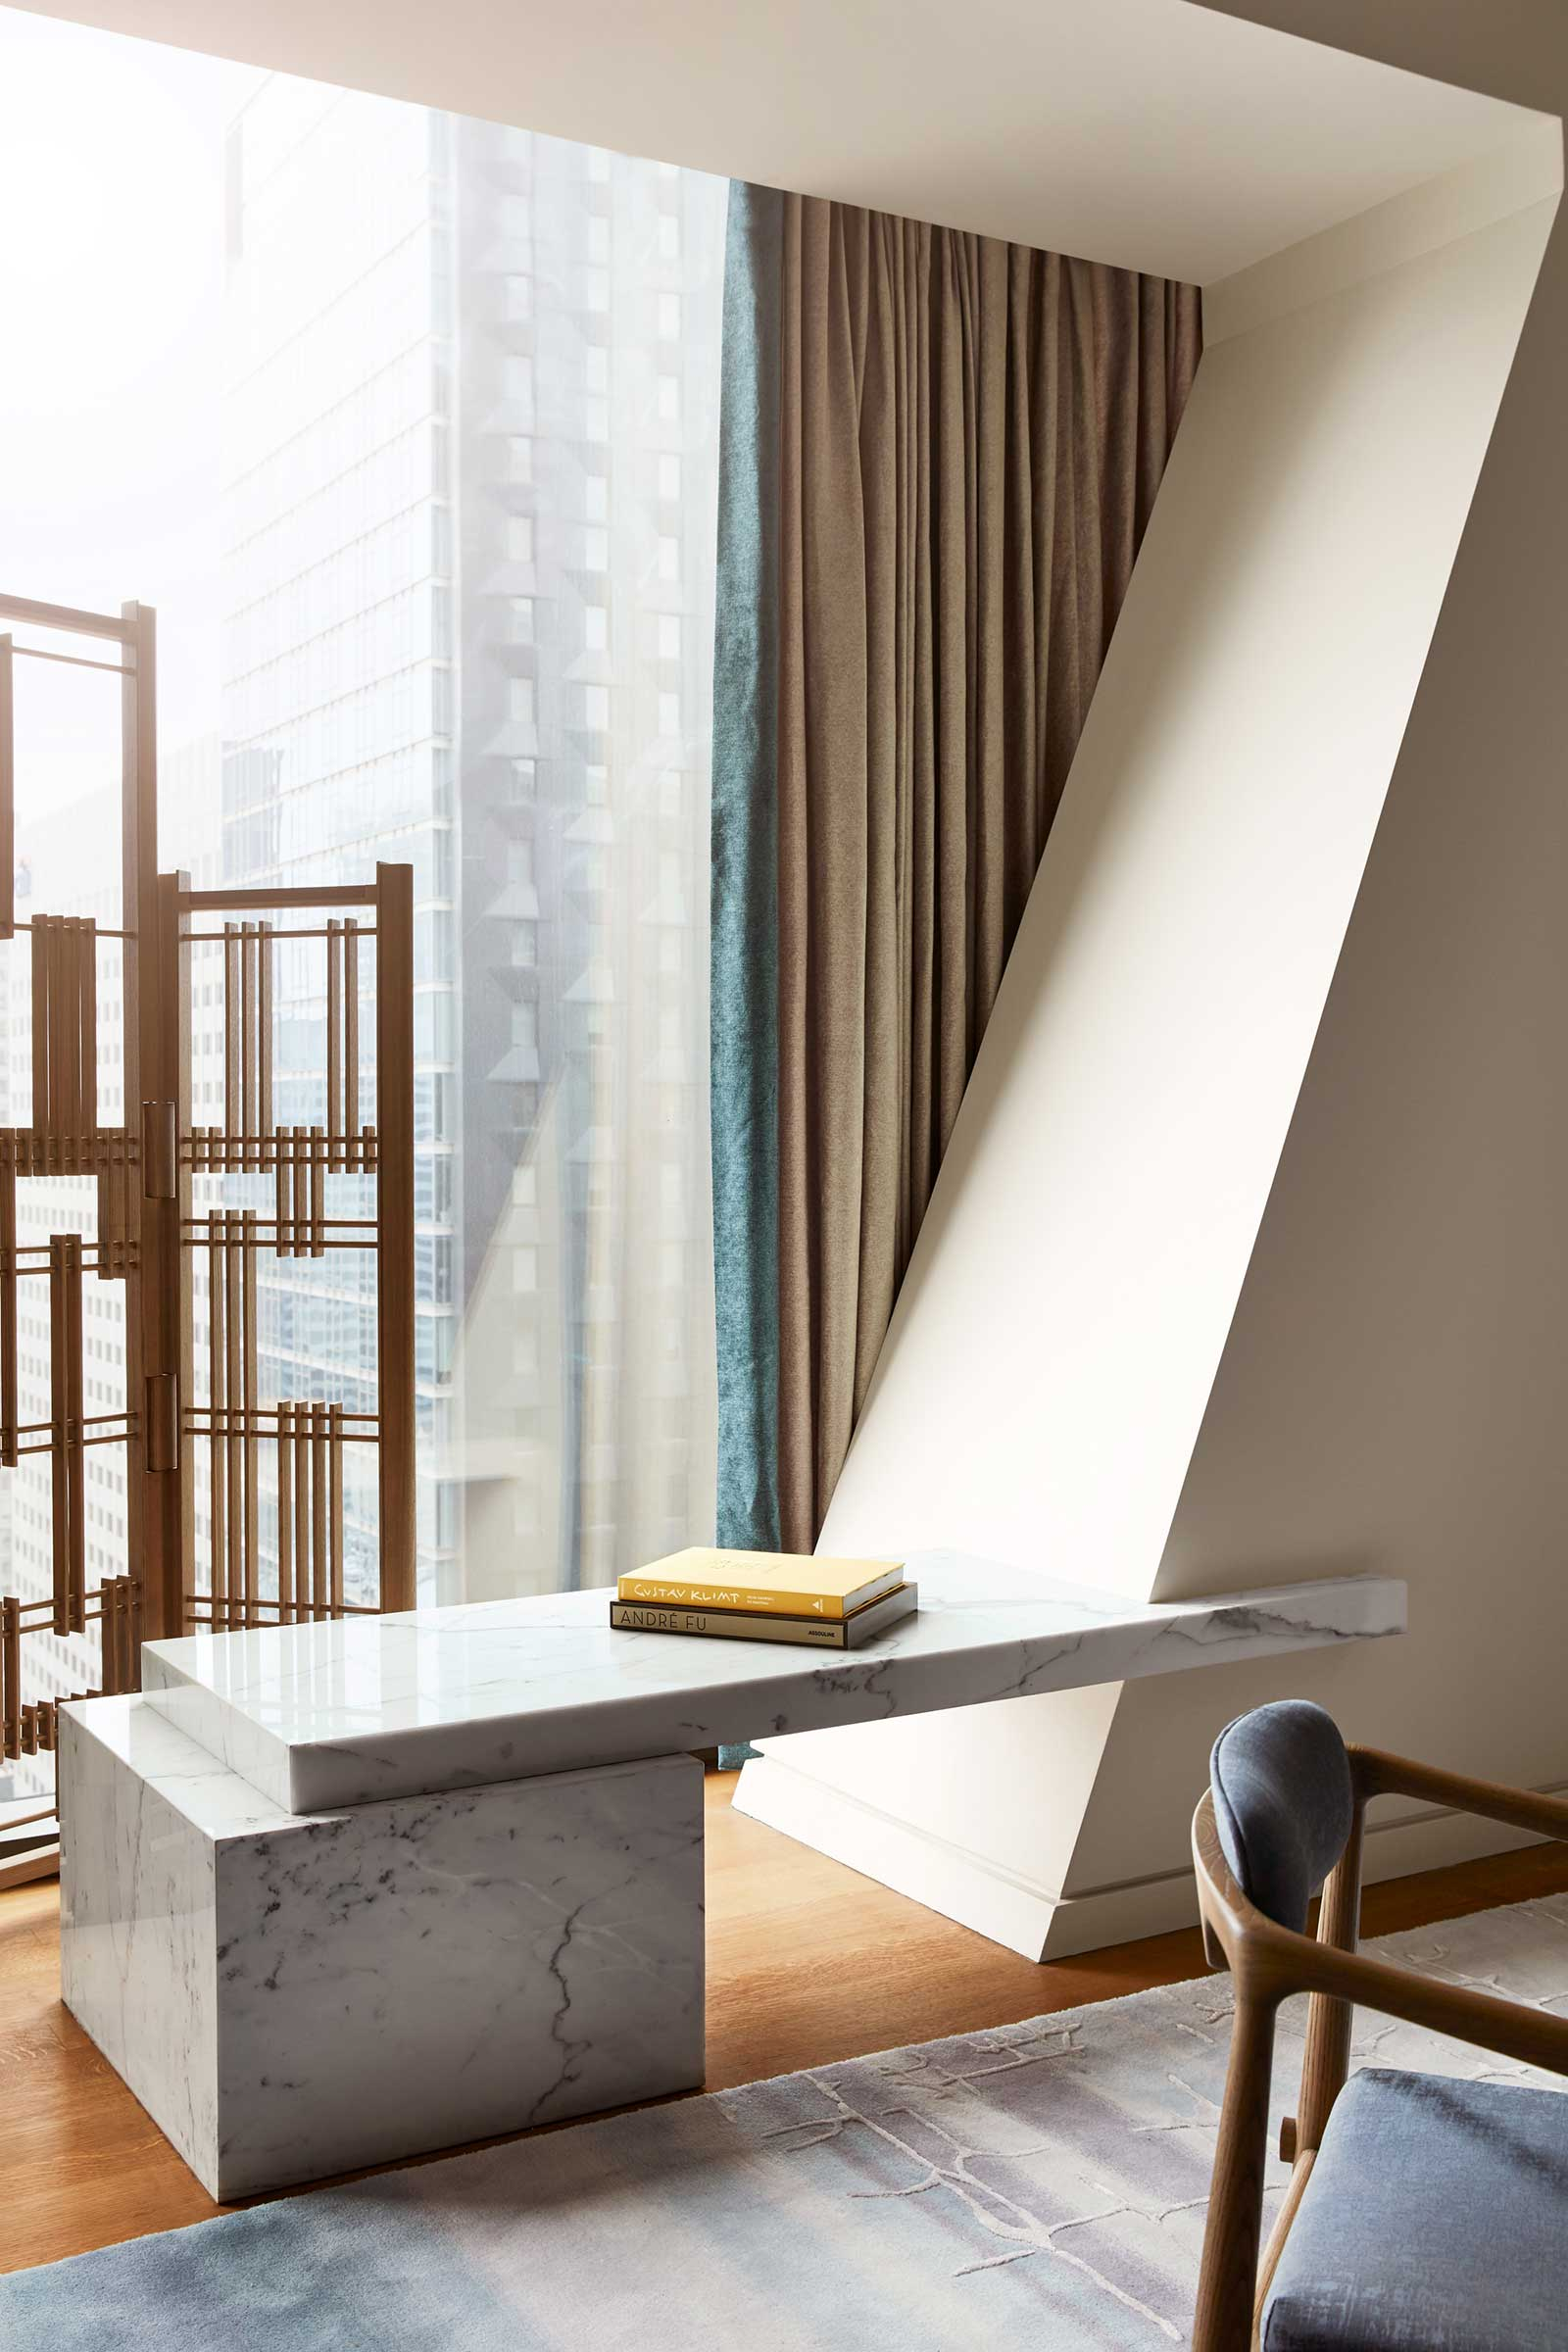 53W53-Living-Room-Diagrid-Marble-Detail_credit-Stephen-Kent-Johnson.jpg